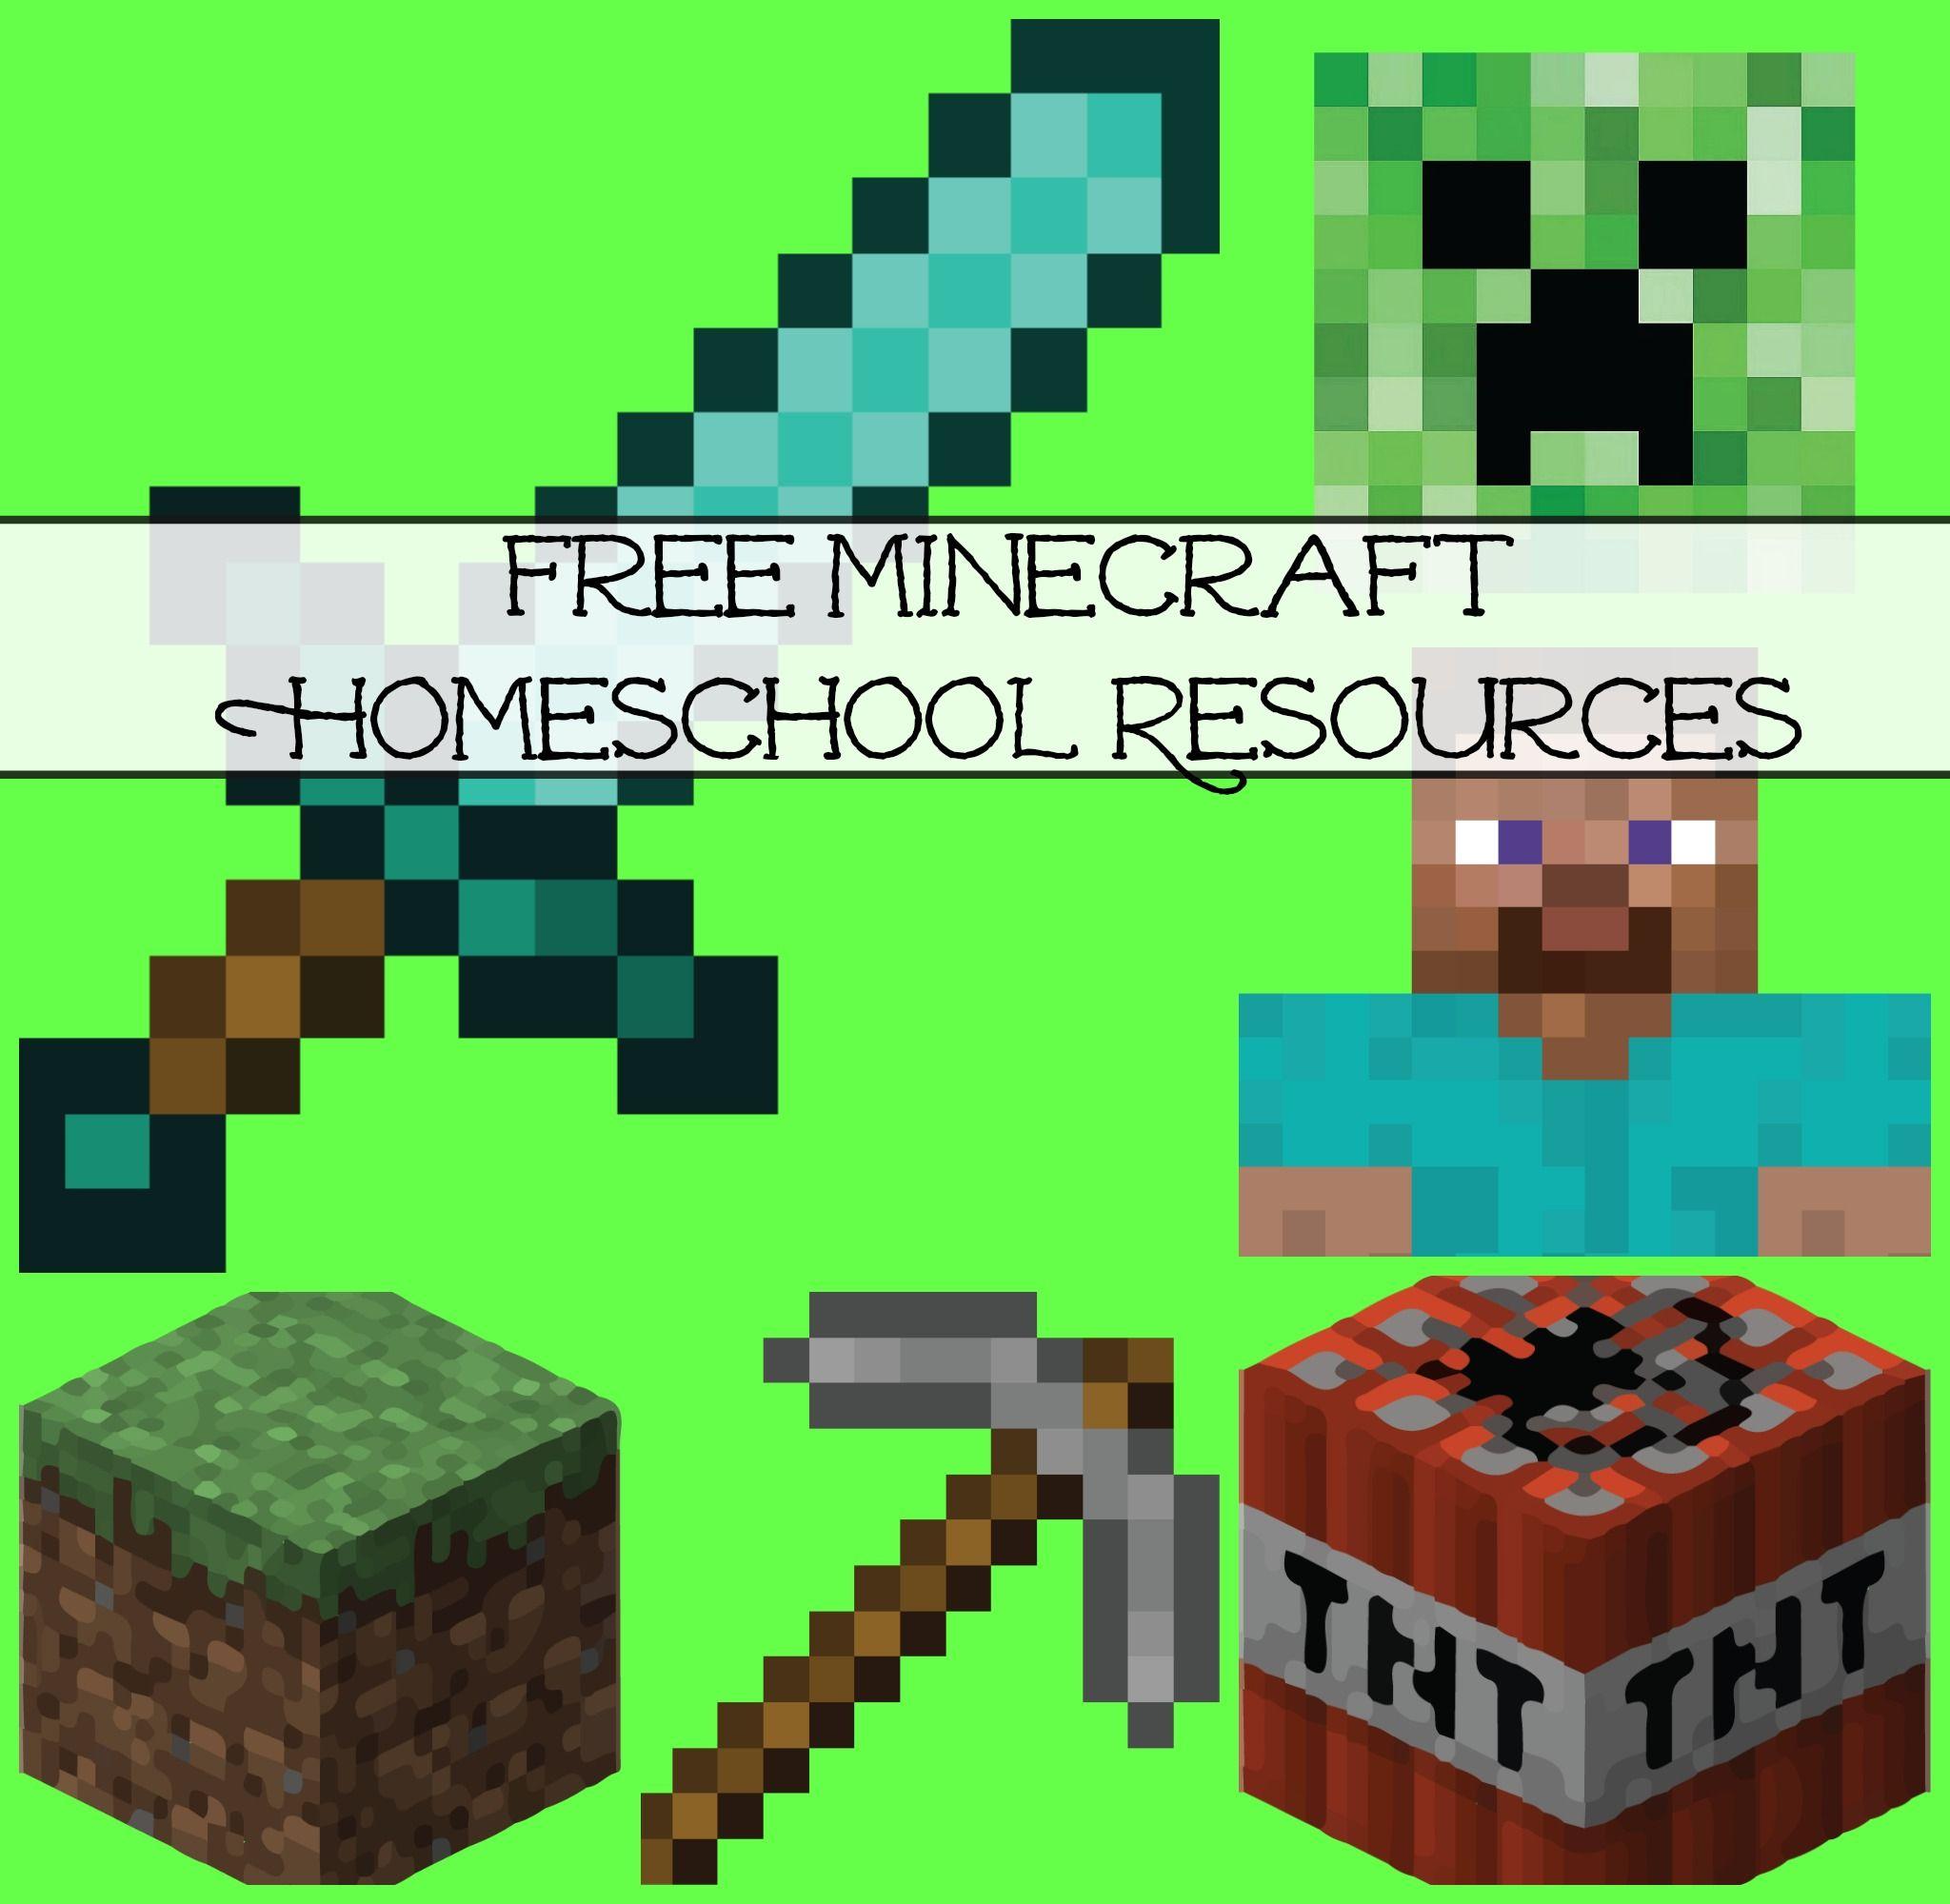 Free Minecraft Homeschool Resources Printables Crafts